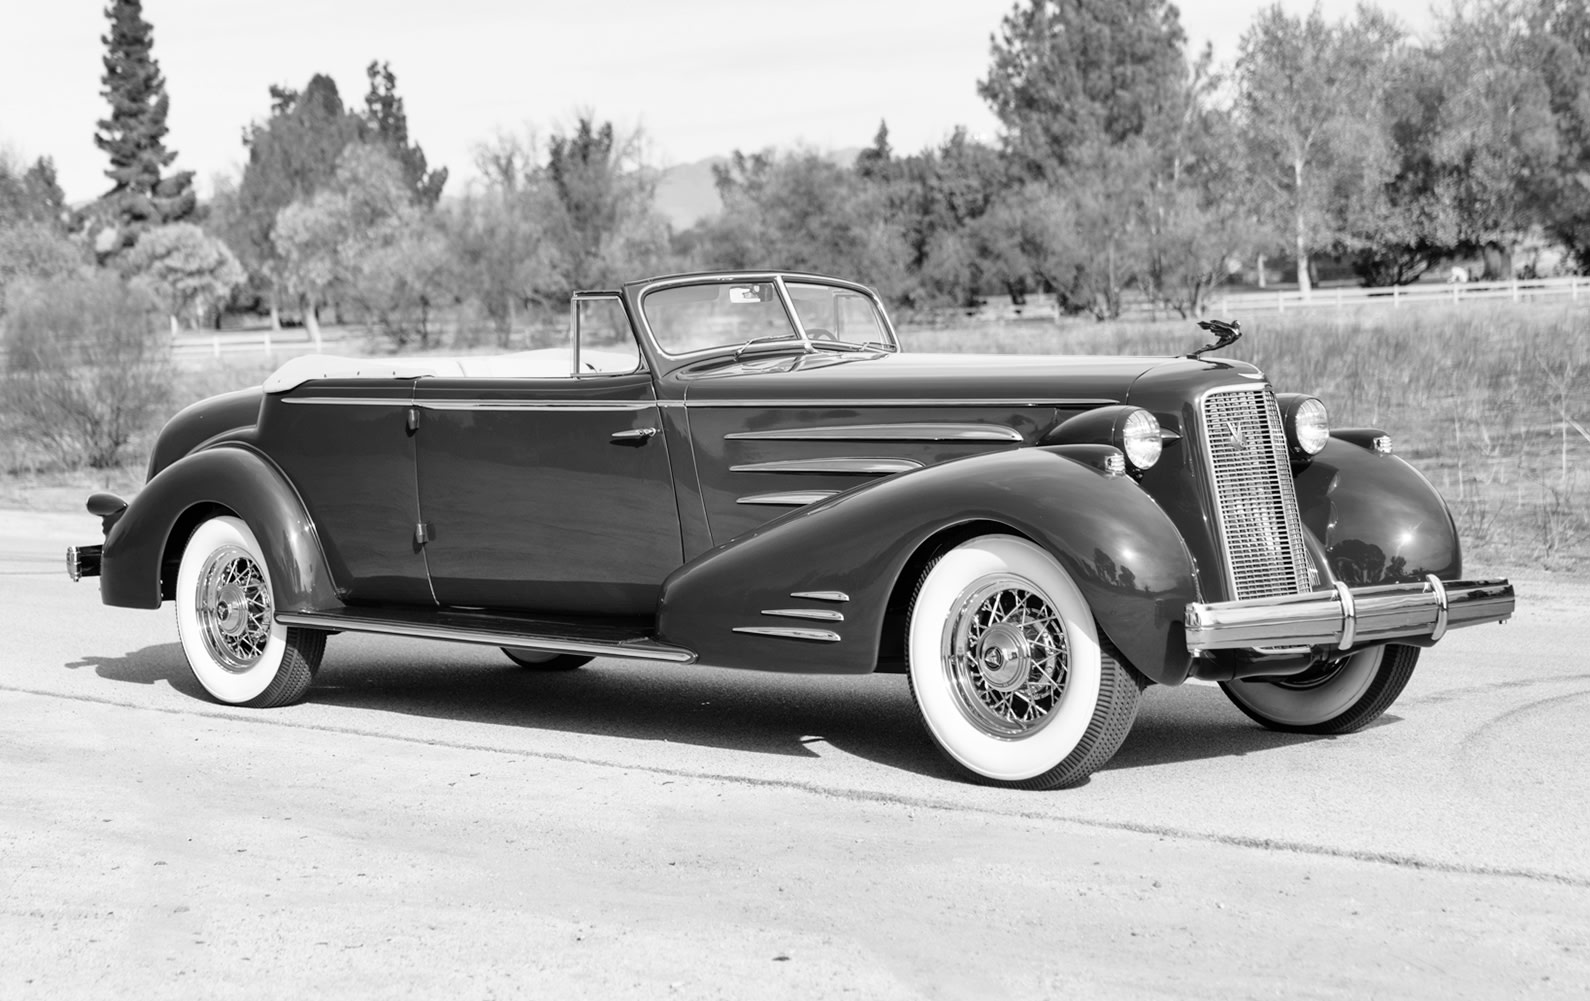 1935 Cadillac V-16 452D Five-Passenger Convertible Coupe